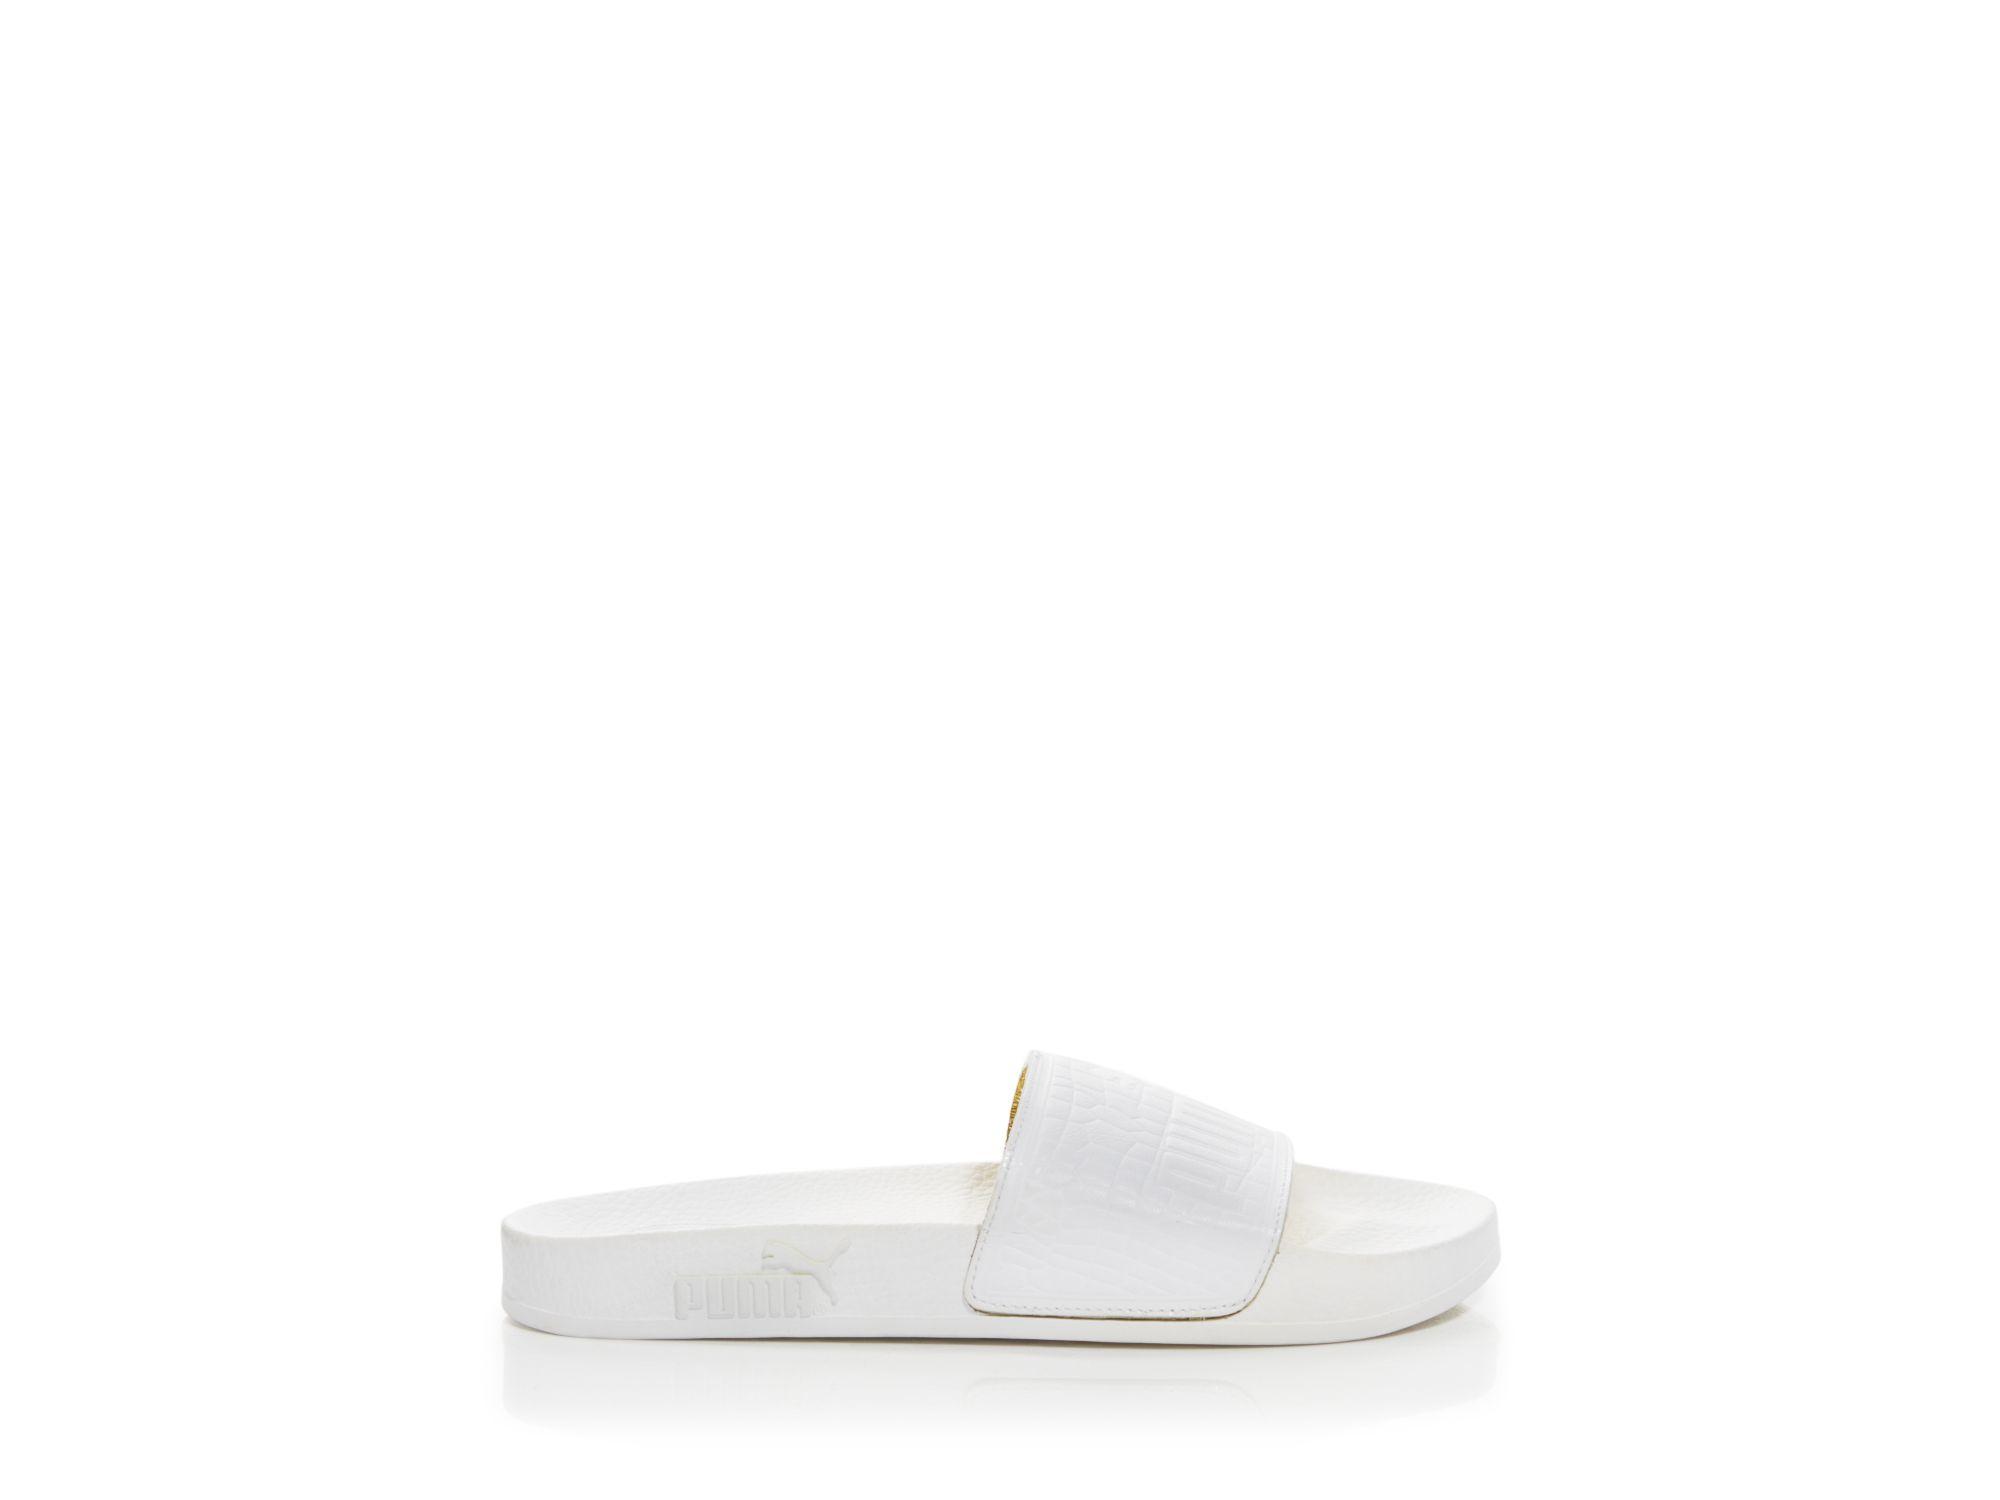 9ae7e4c676128 Lyst - PUMA Triple Black Silder Flat Sandals in Black